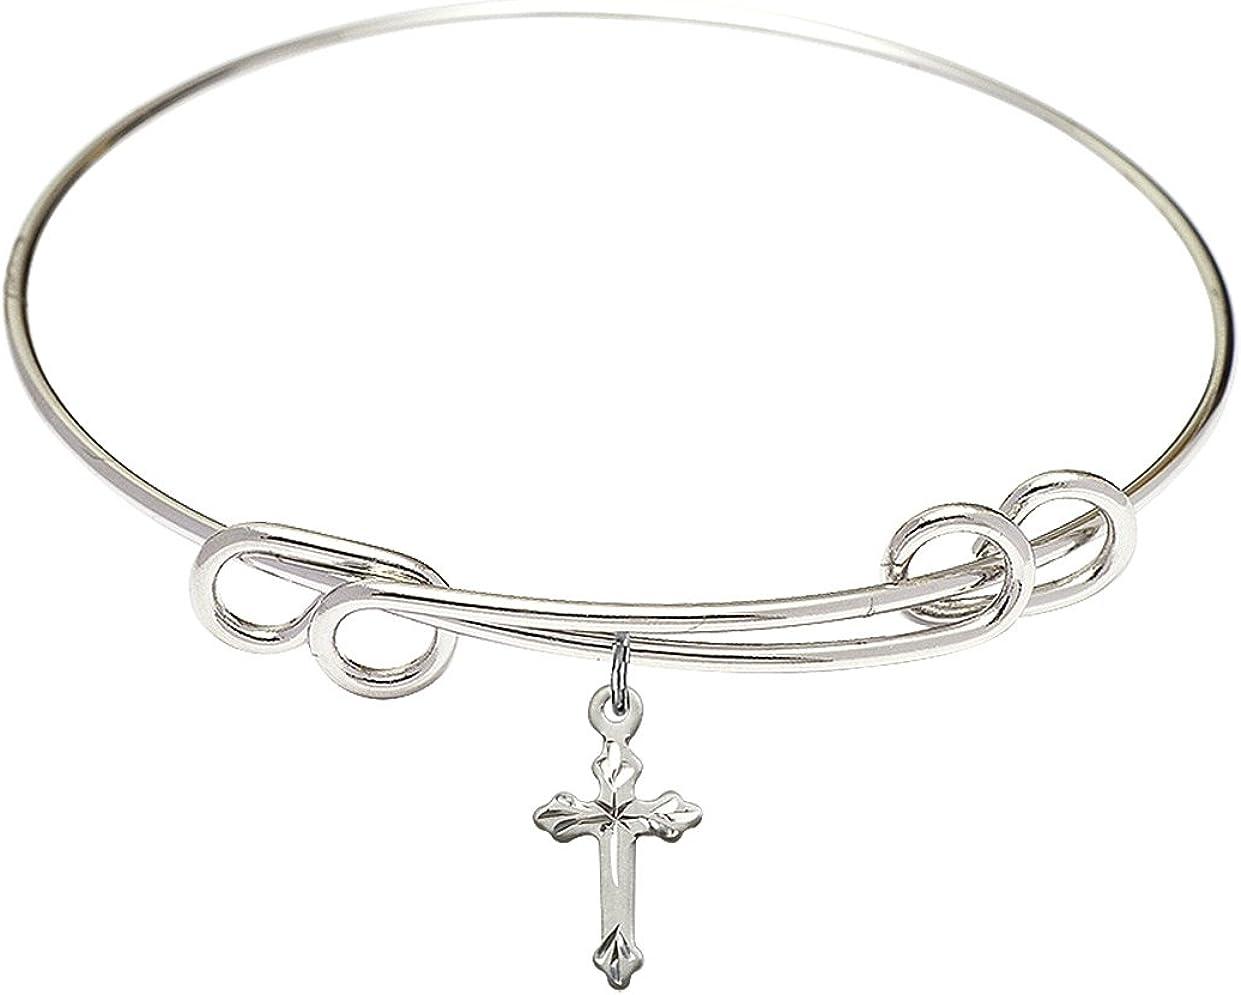 DiamondJewelryNY Double Department store Loop Bangle Topics on TV Bracelet Charm. Cross with a